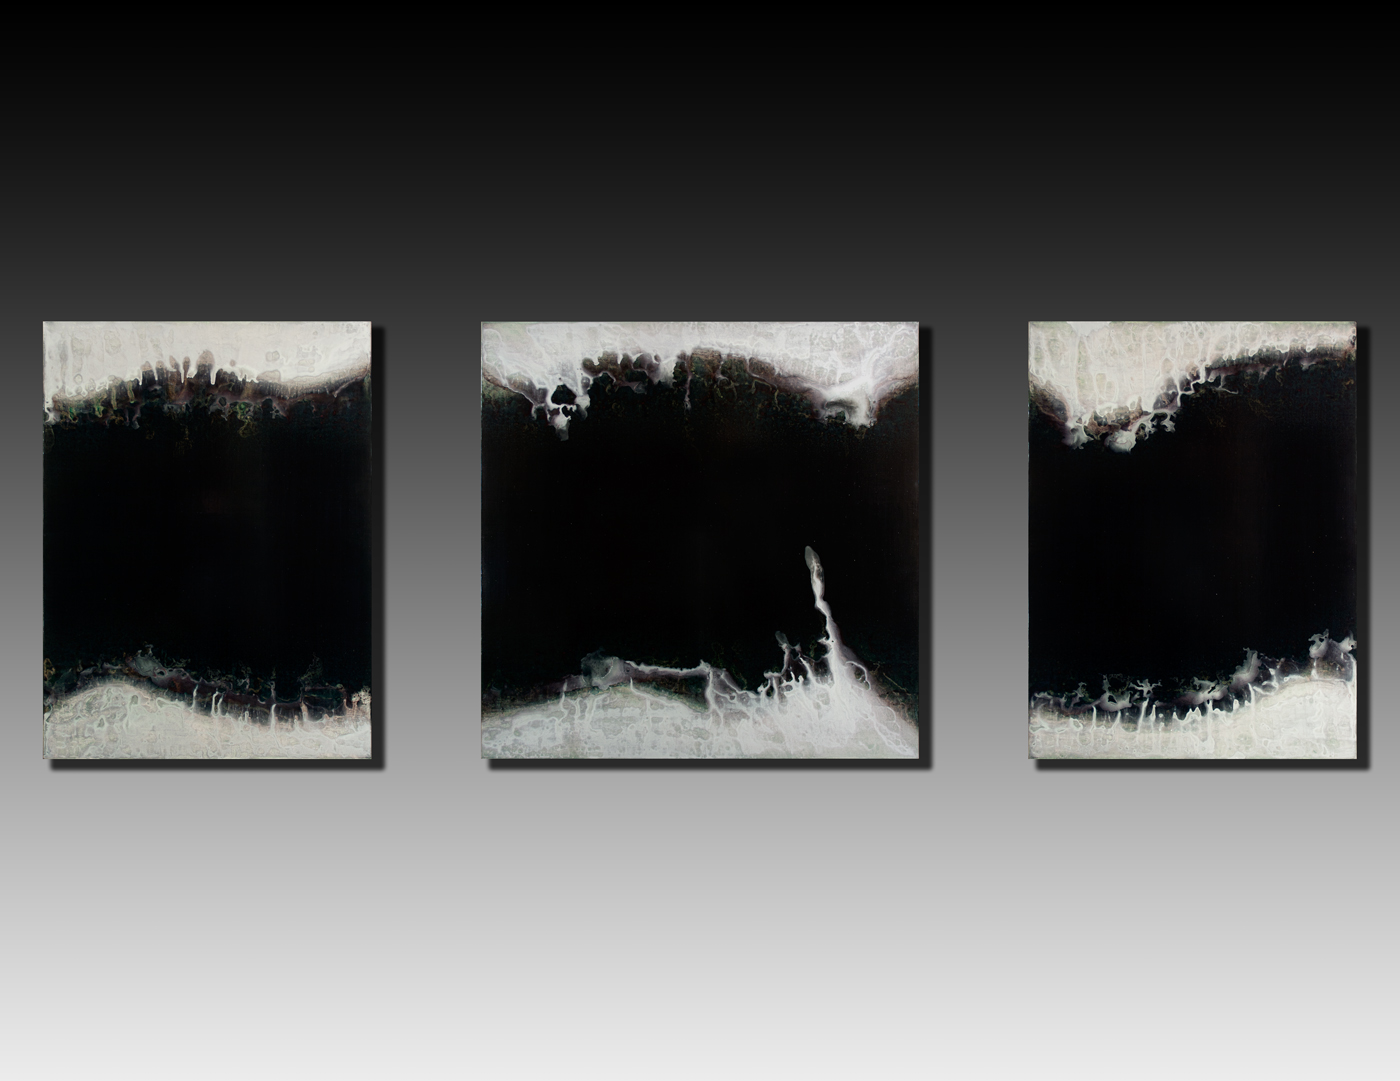 Shaun Whiteside - 2015 Gulf triptych 48x144 inches